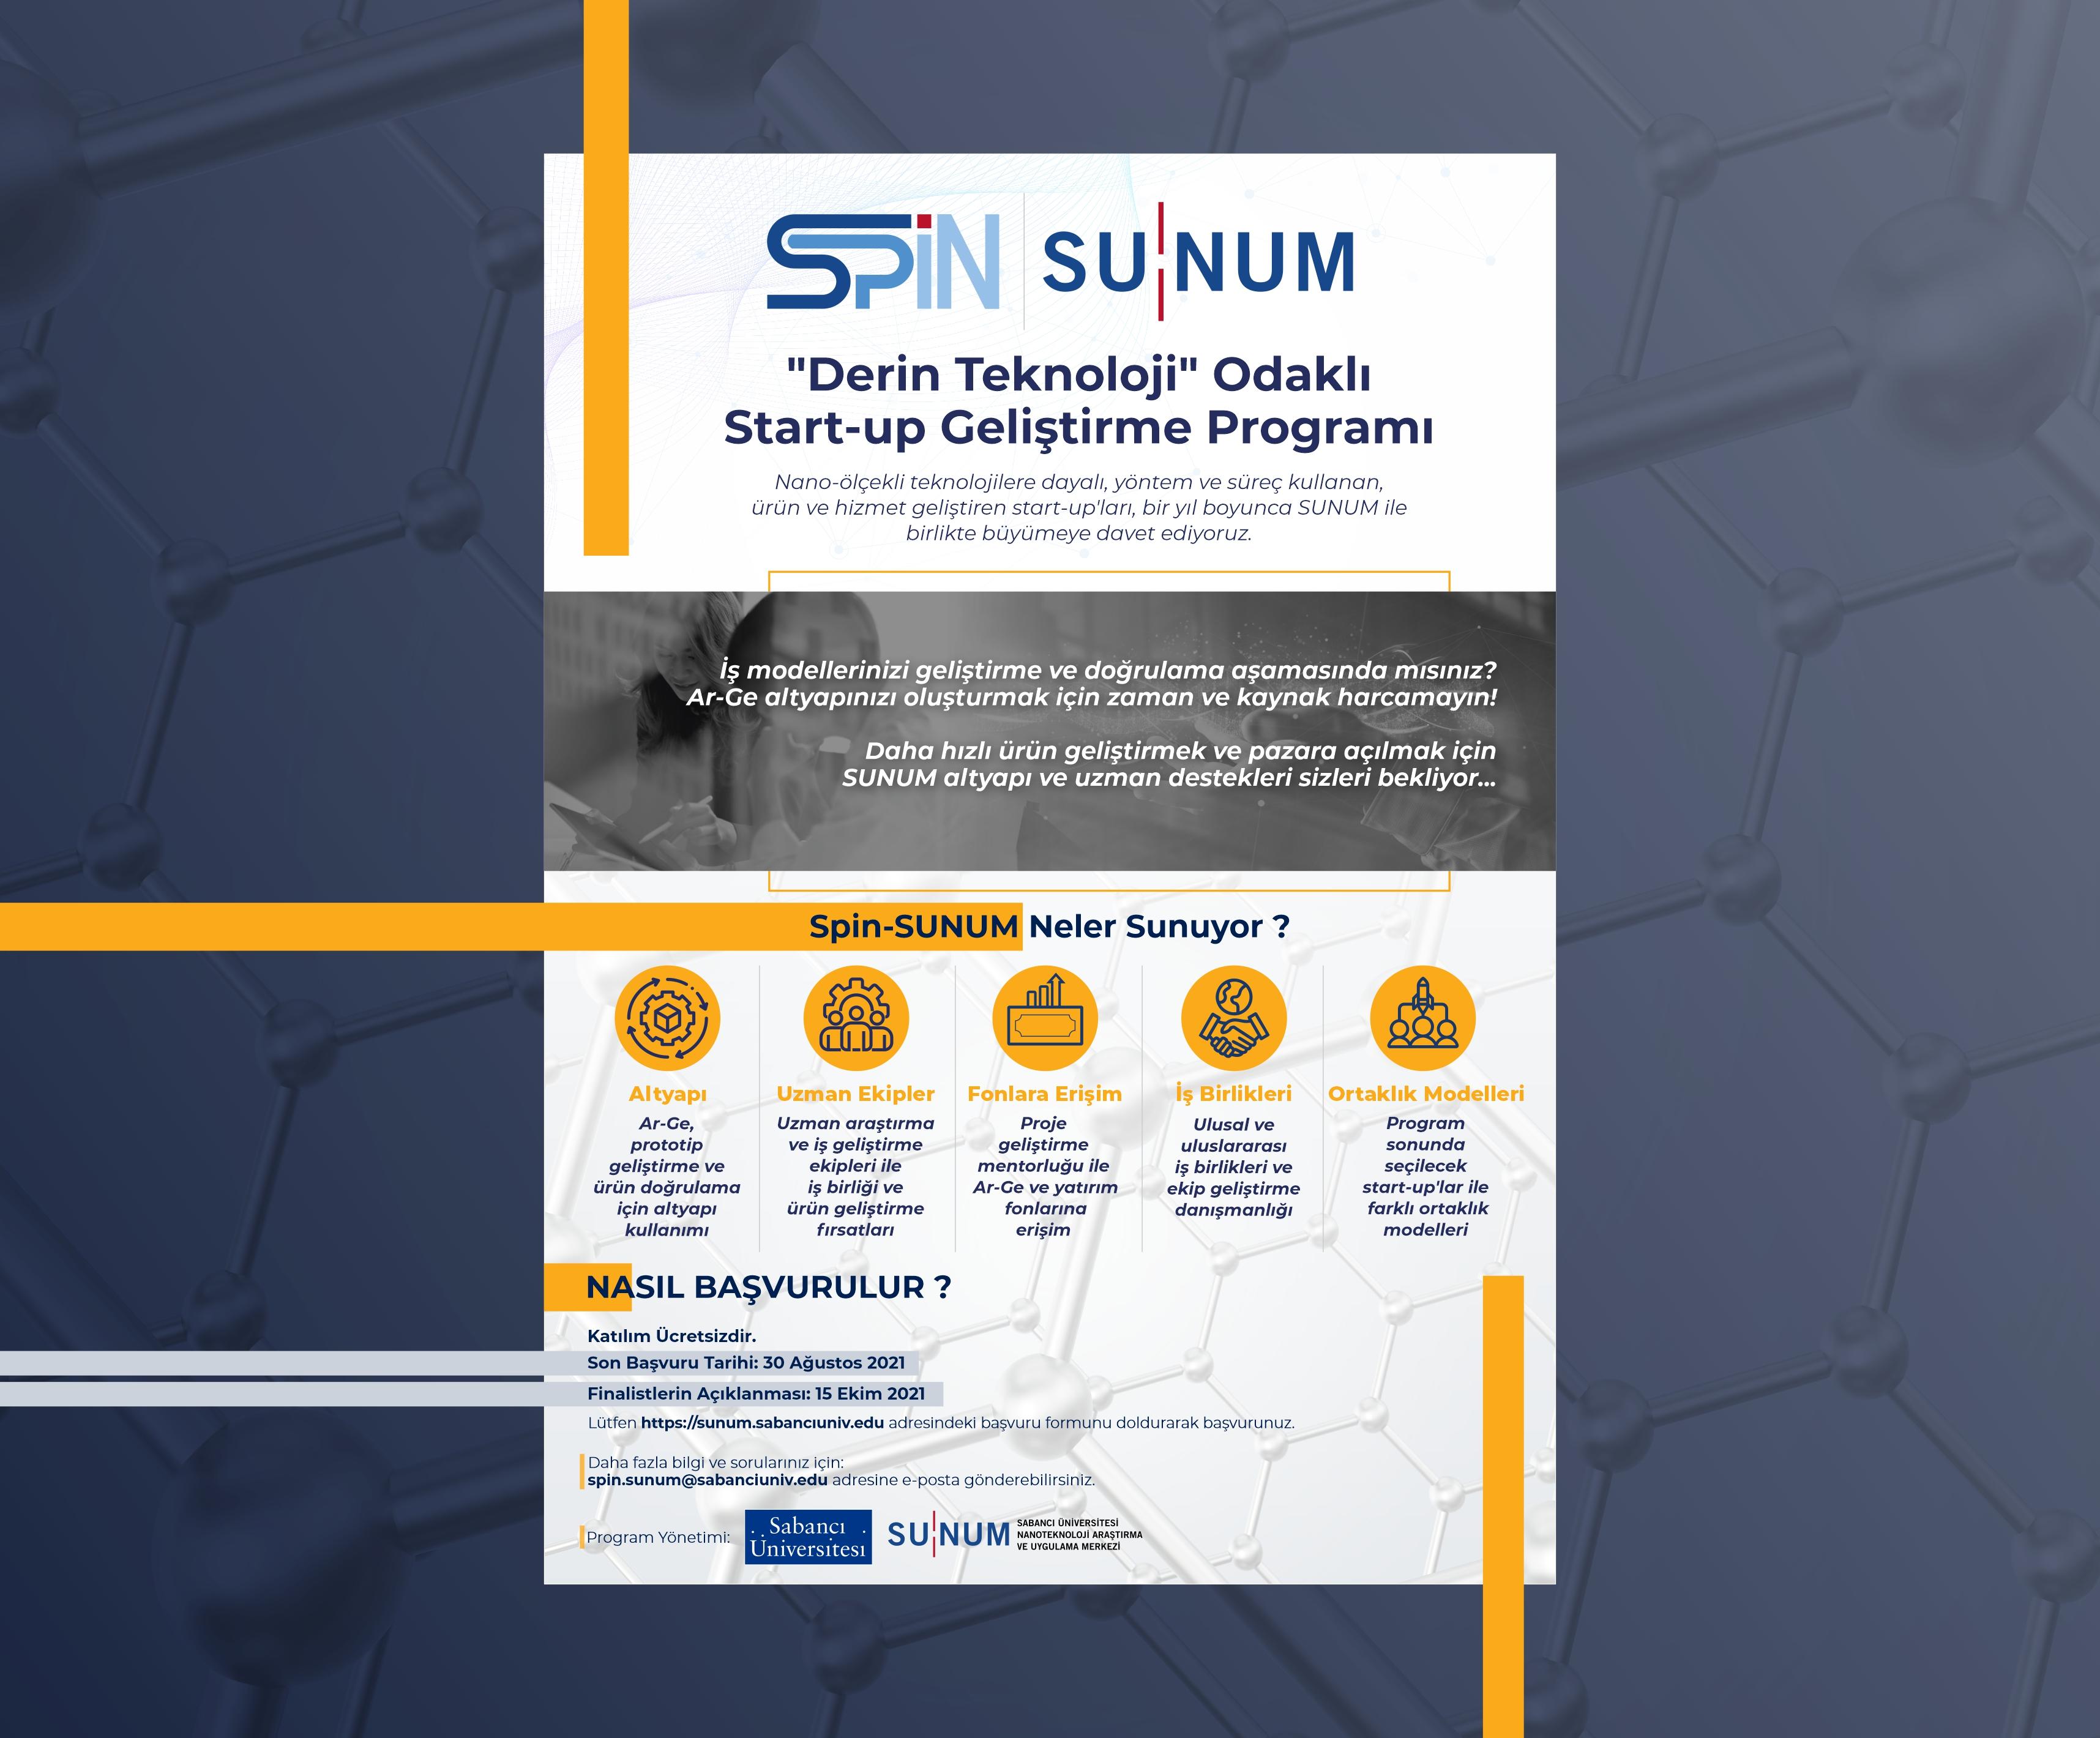 Spin Sunum